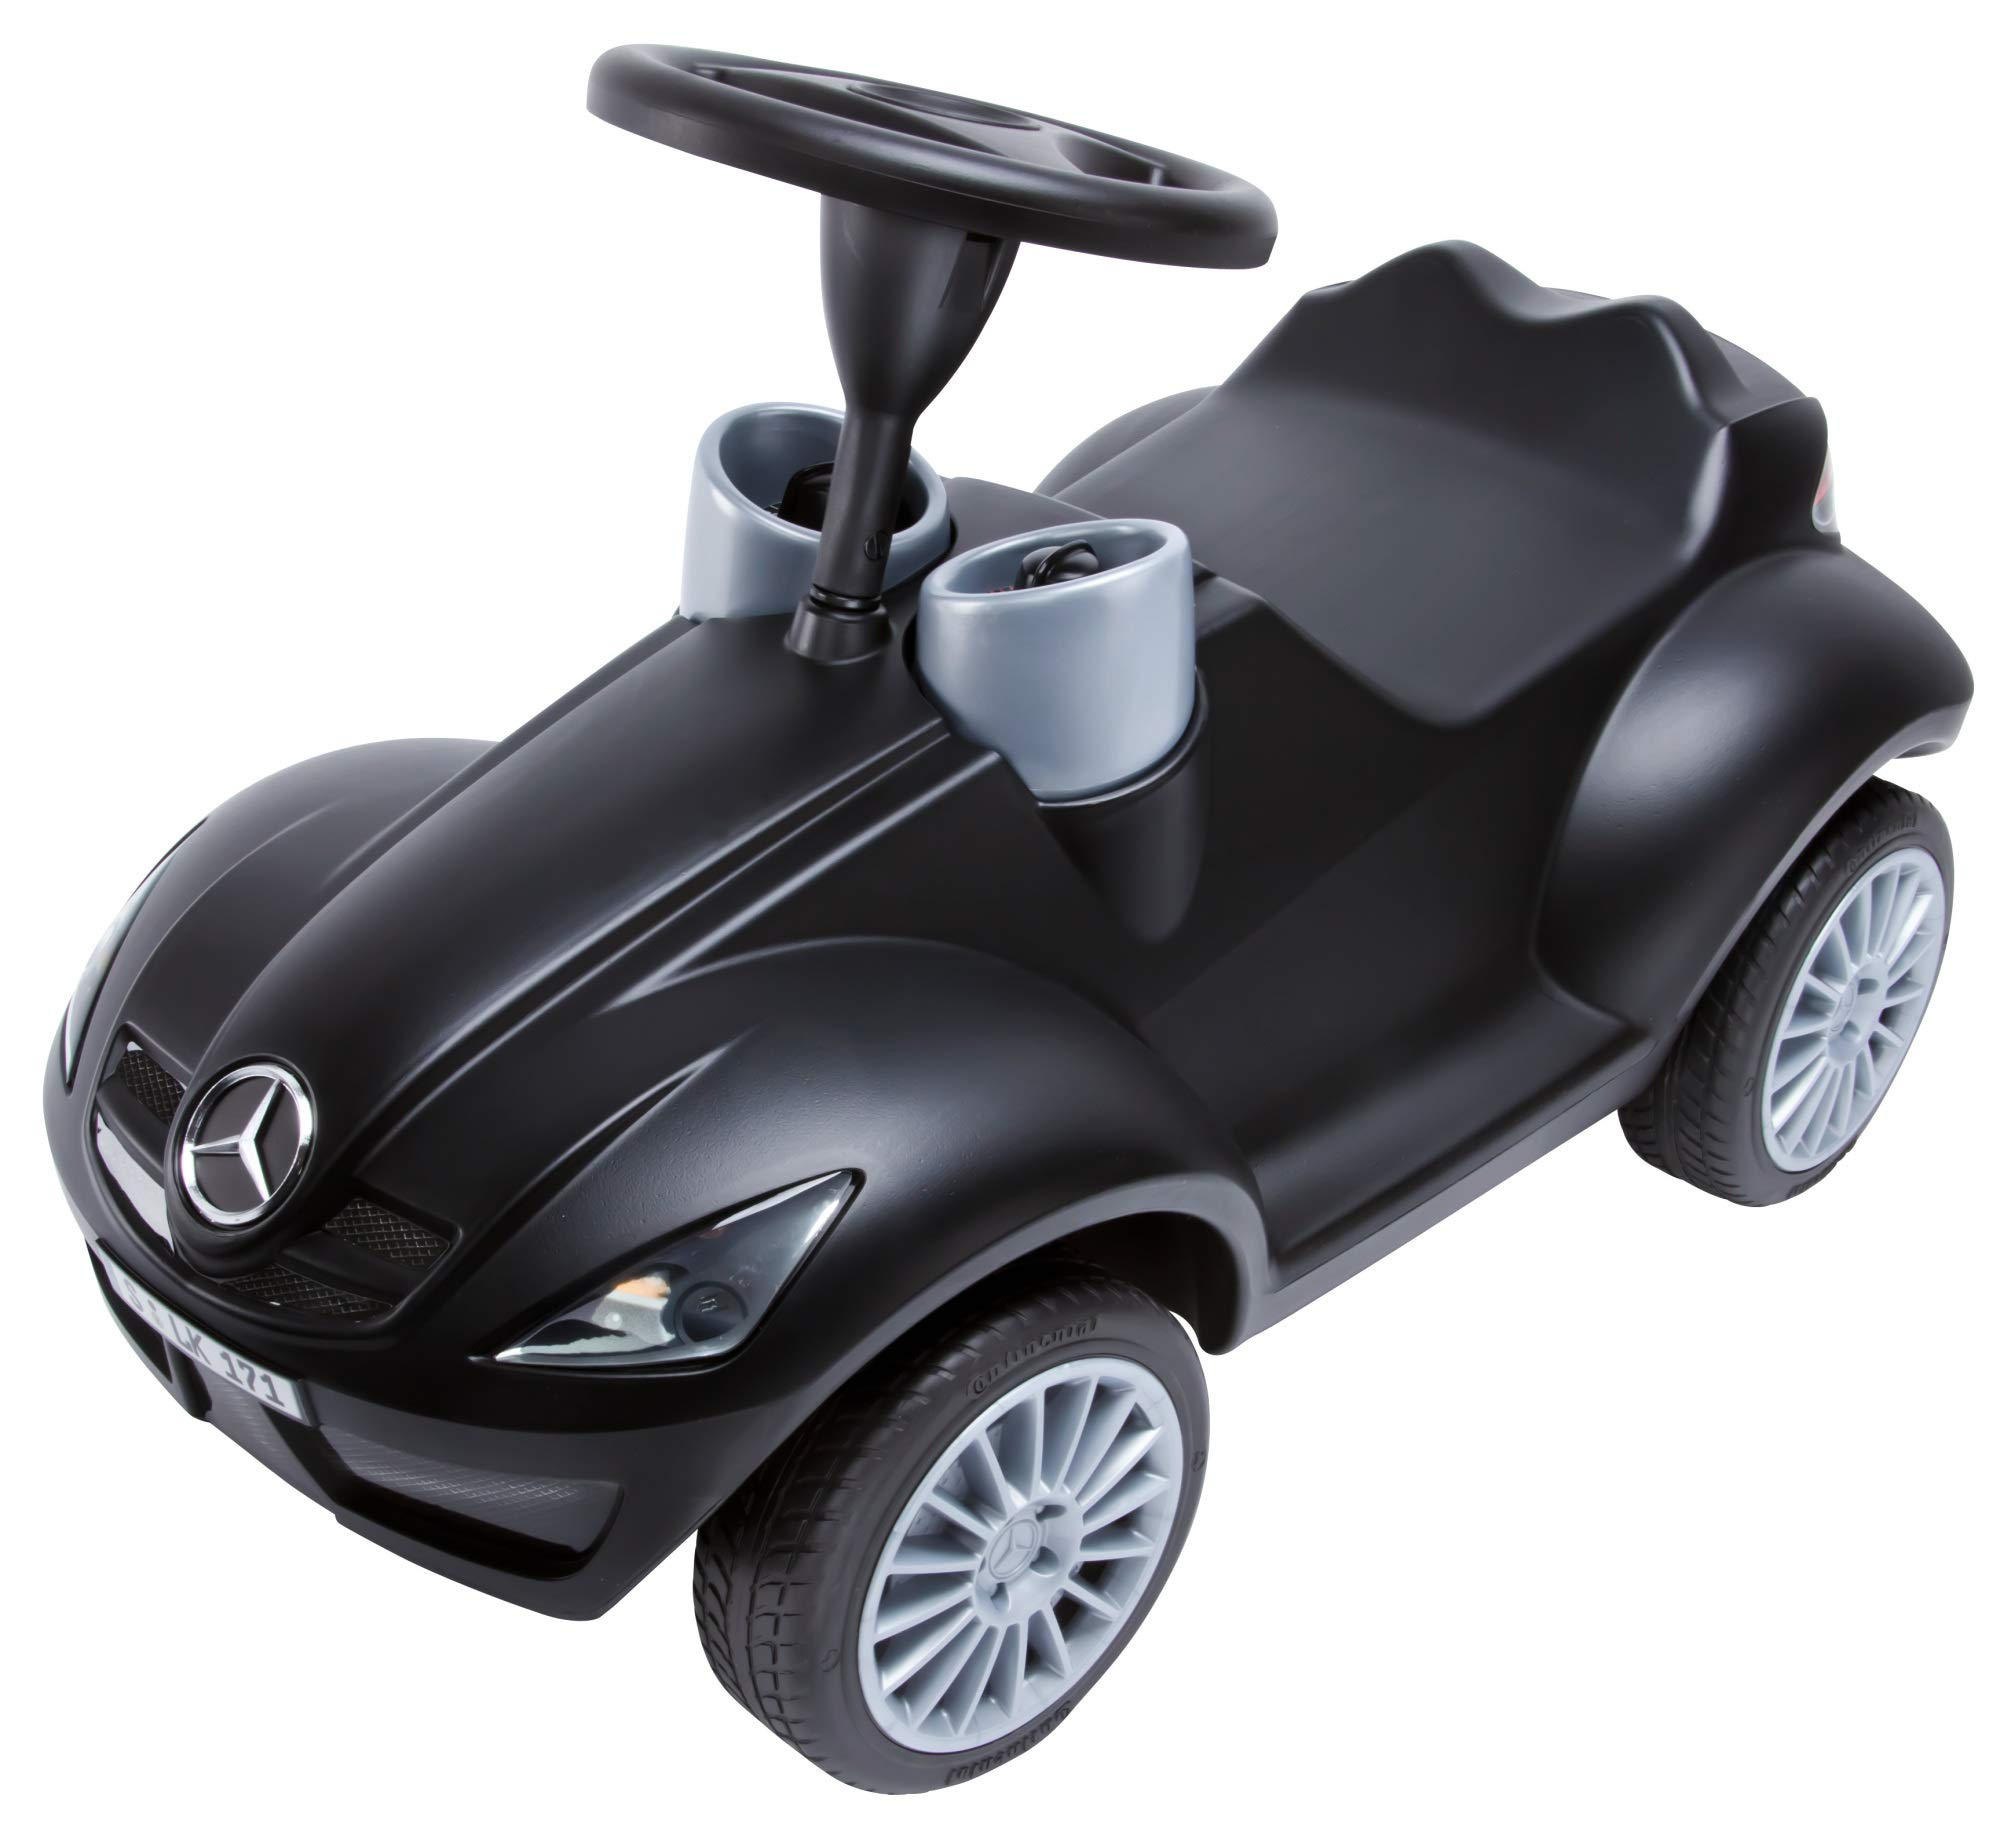 Big Bobby Car Ersatzteile Hupen Lenkrad Kaufen Sie Immer Gut Radkappen